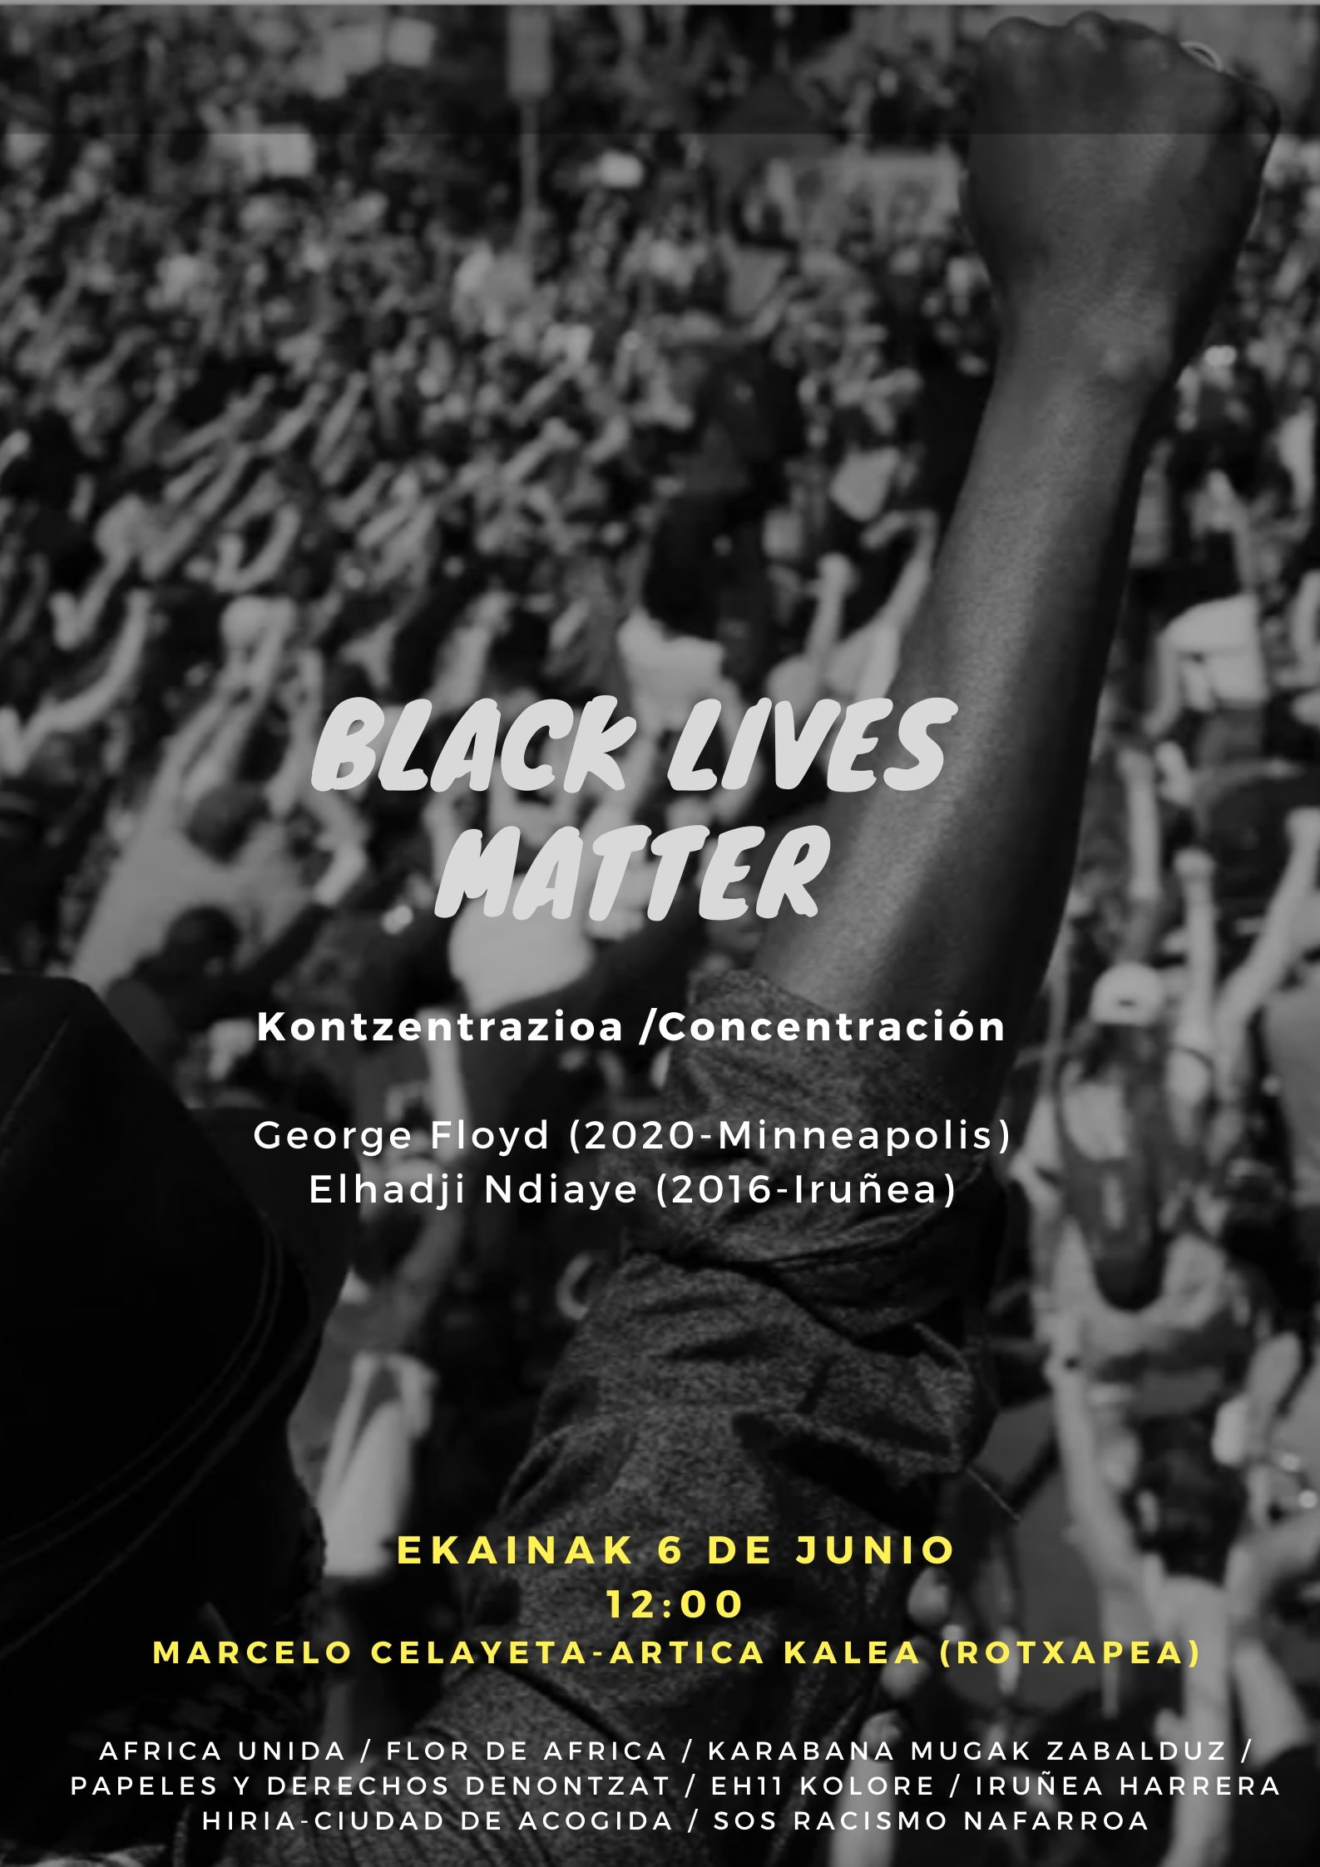 Kontzentrazioa/Concentración Black Lives Matter (Ekainak 6 Junio 12:00)